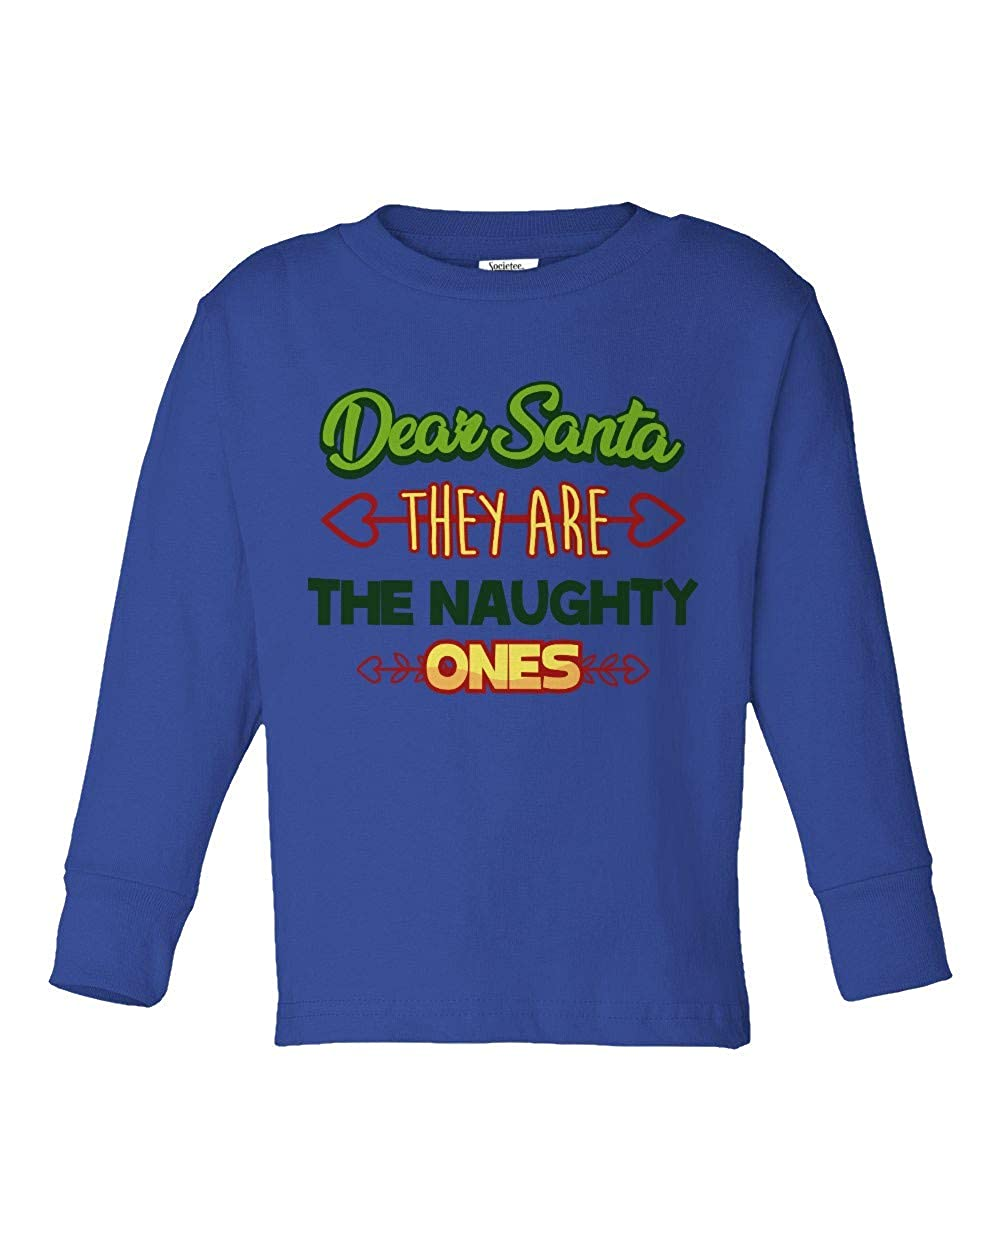 Societee Dear Santa Theyre The Naughty Ones Girls Boys Toddler Long Sleeve T-Shirt